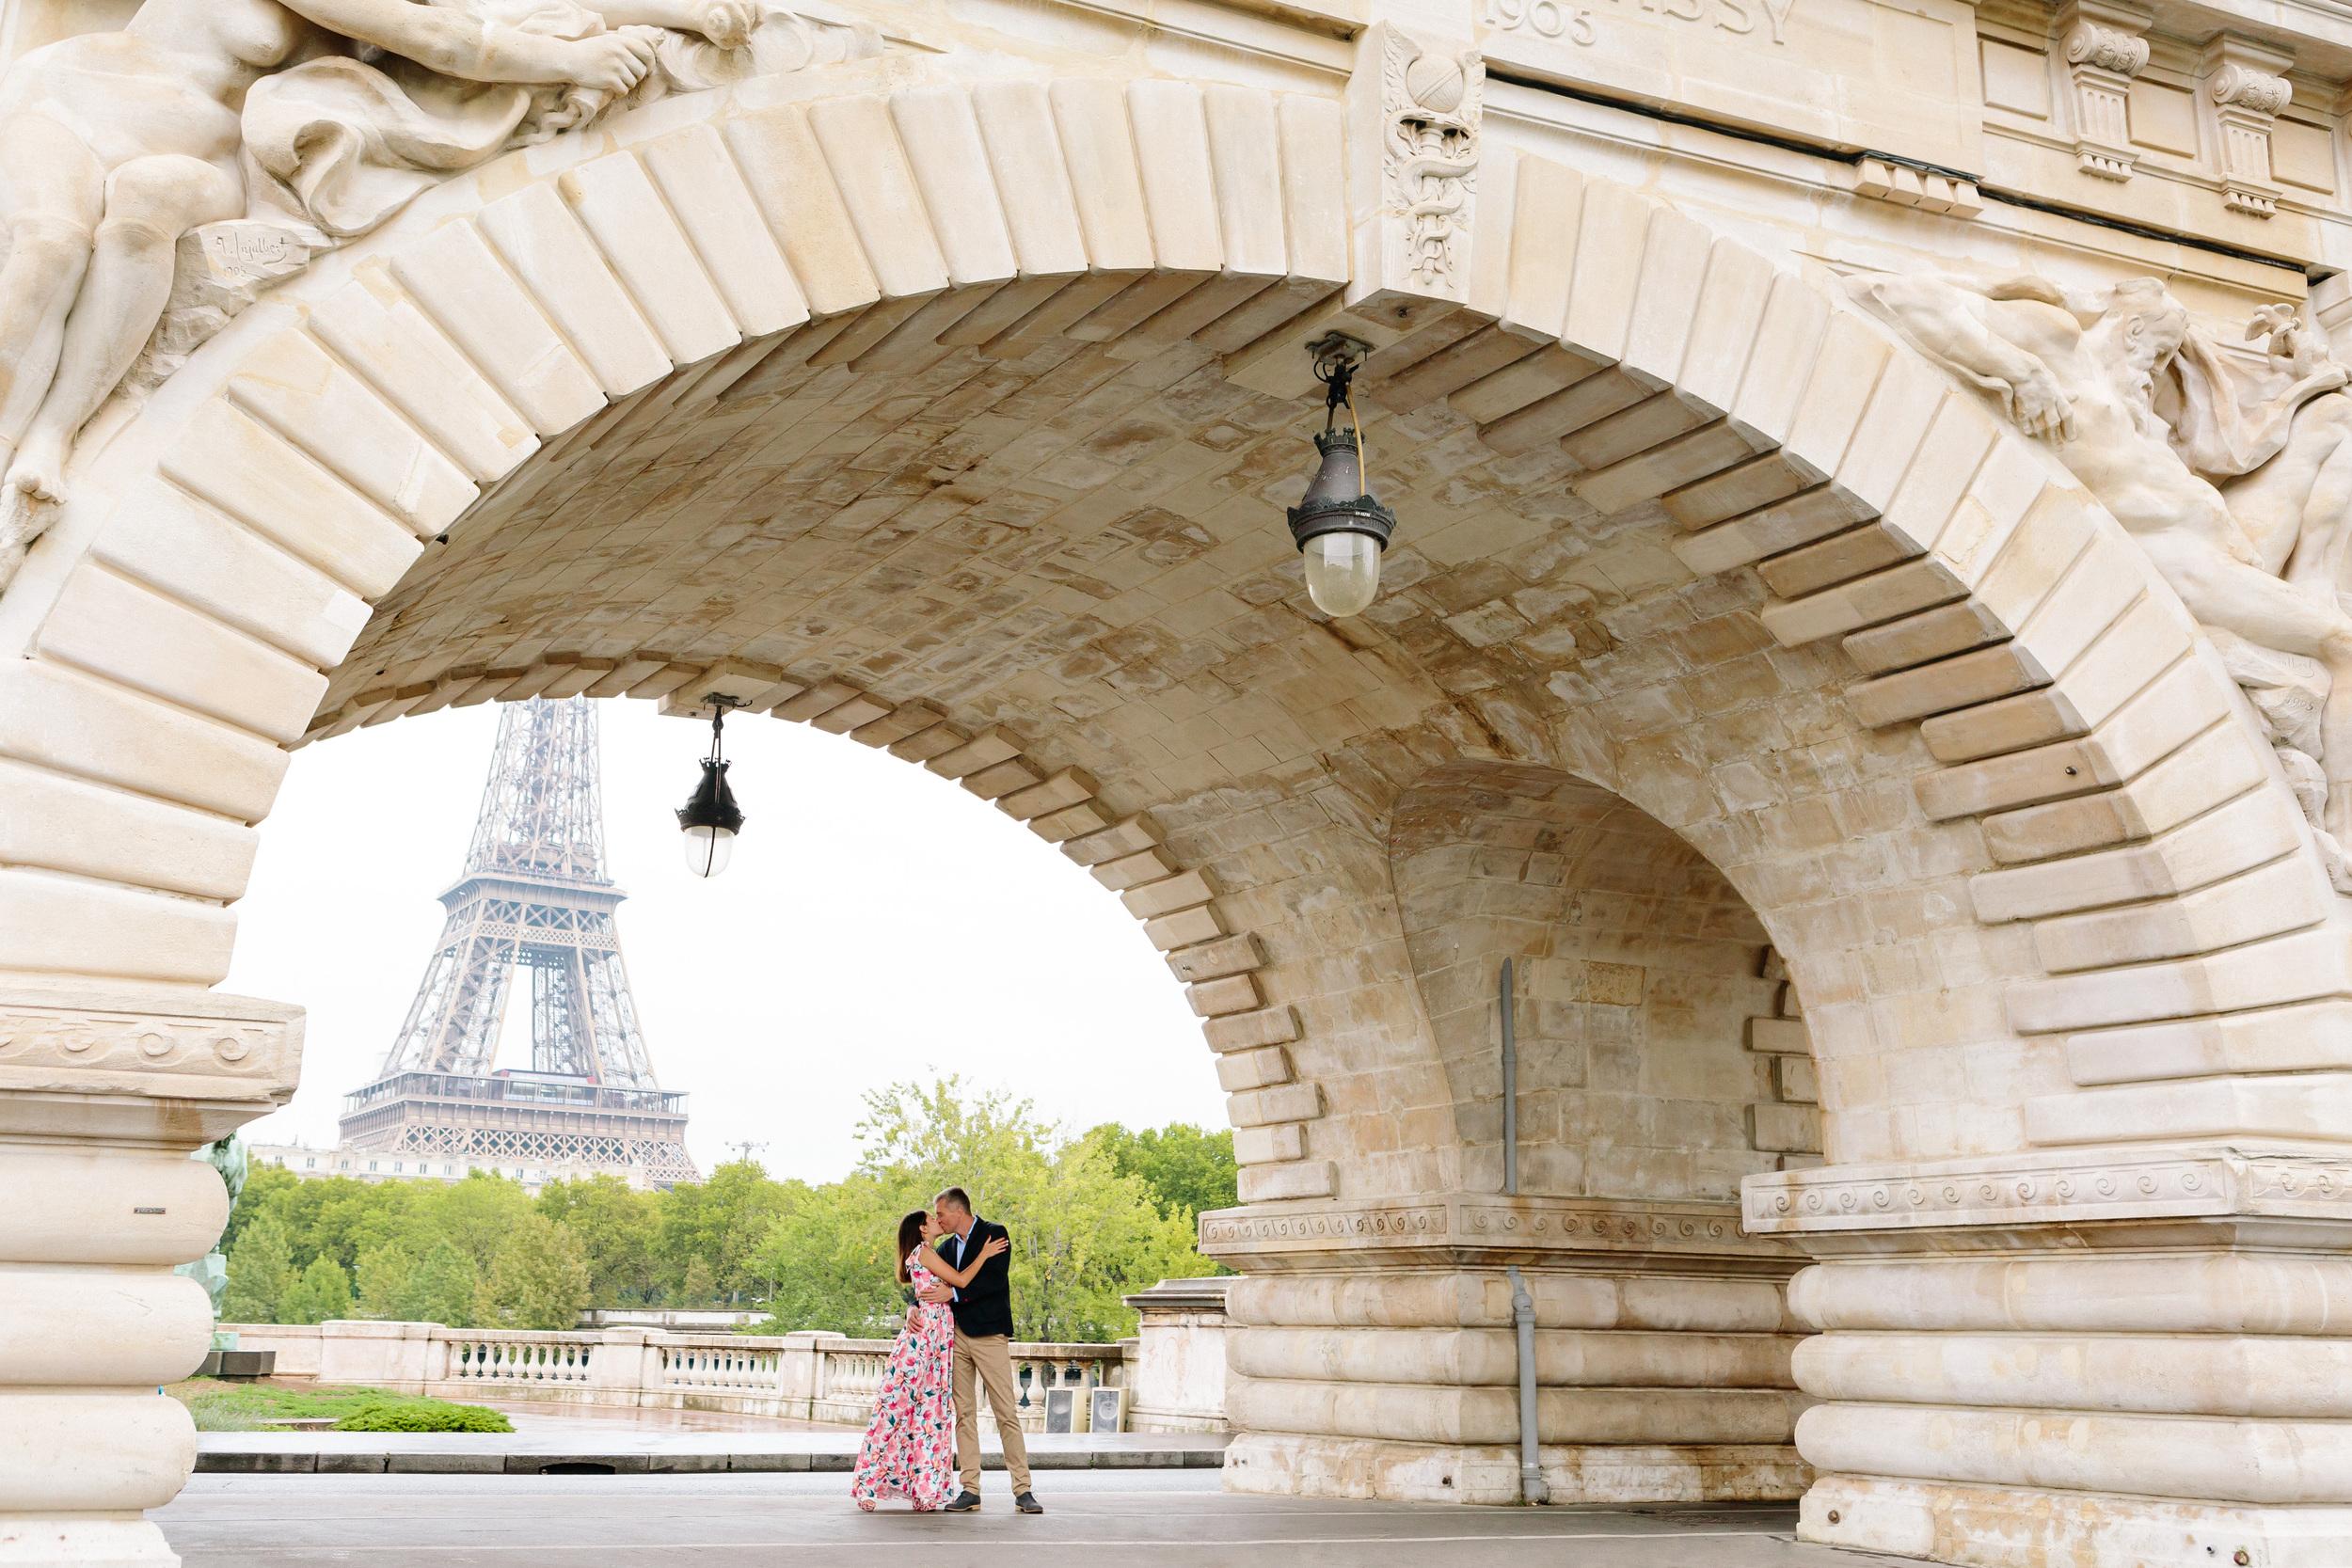 couple portrait under the arch of bir-hakeim bridge with view of eiffel tower at sunrise captured by paris photographer federico guendel